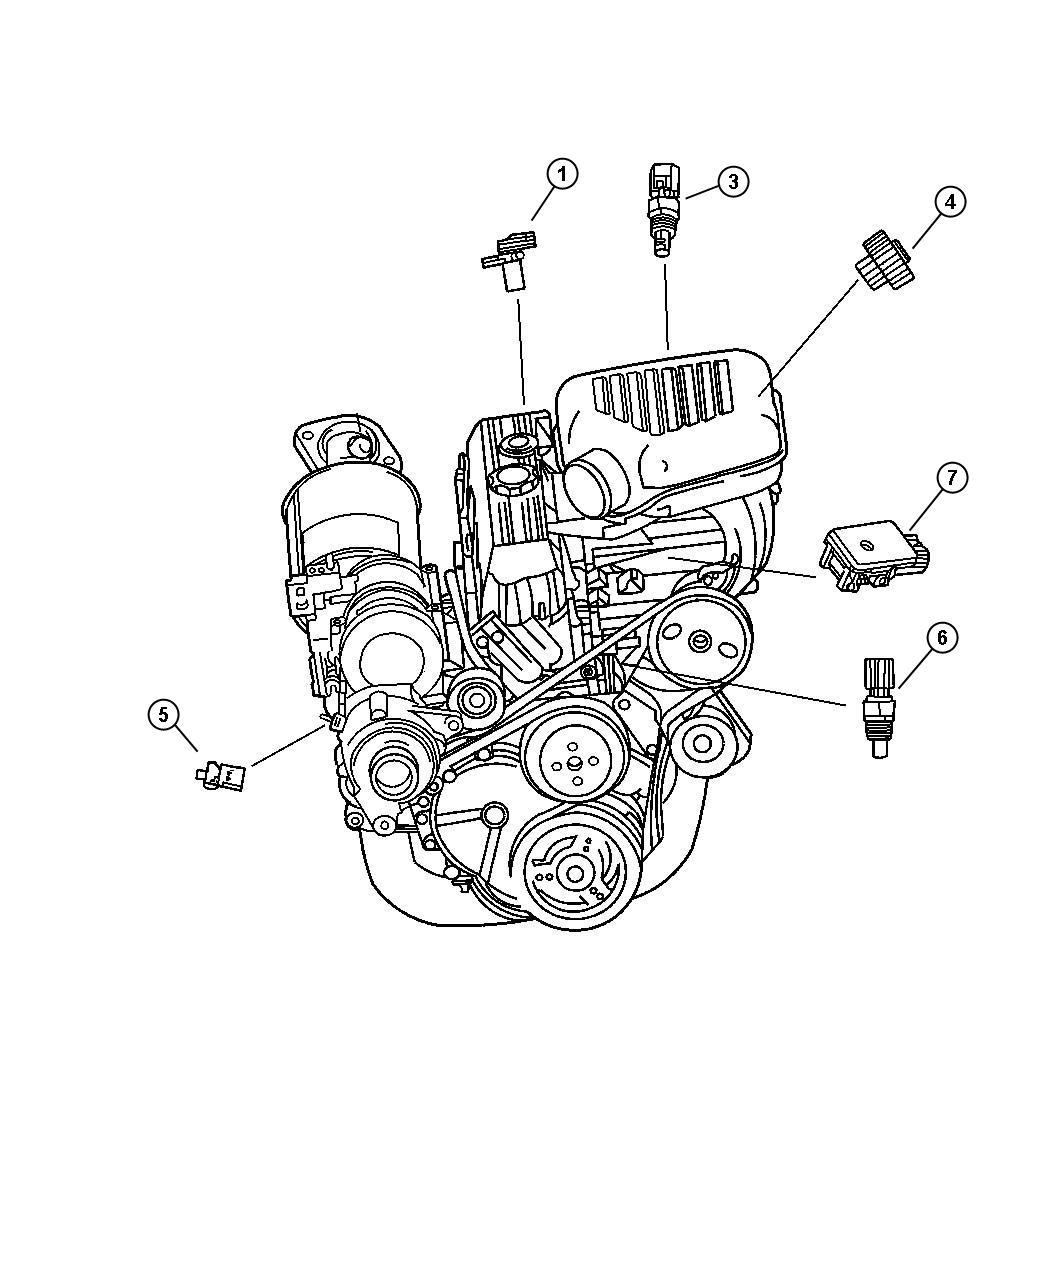 Chrysler Sebring Sensor Camshaft Engine Gas